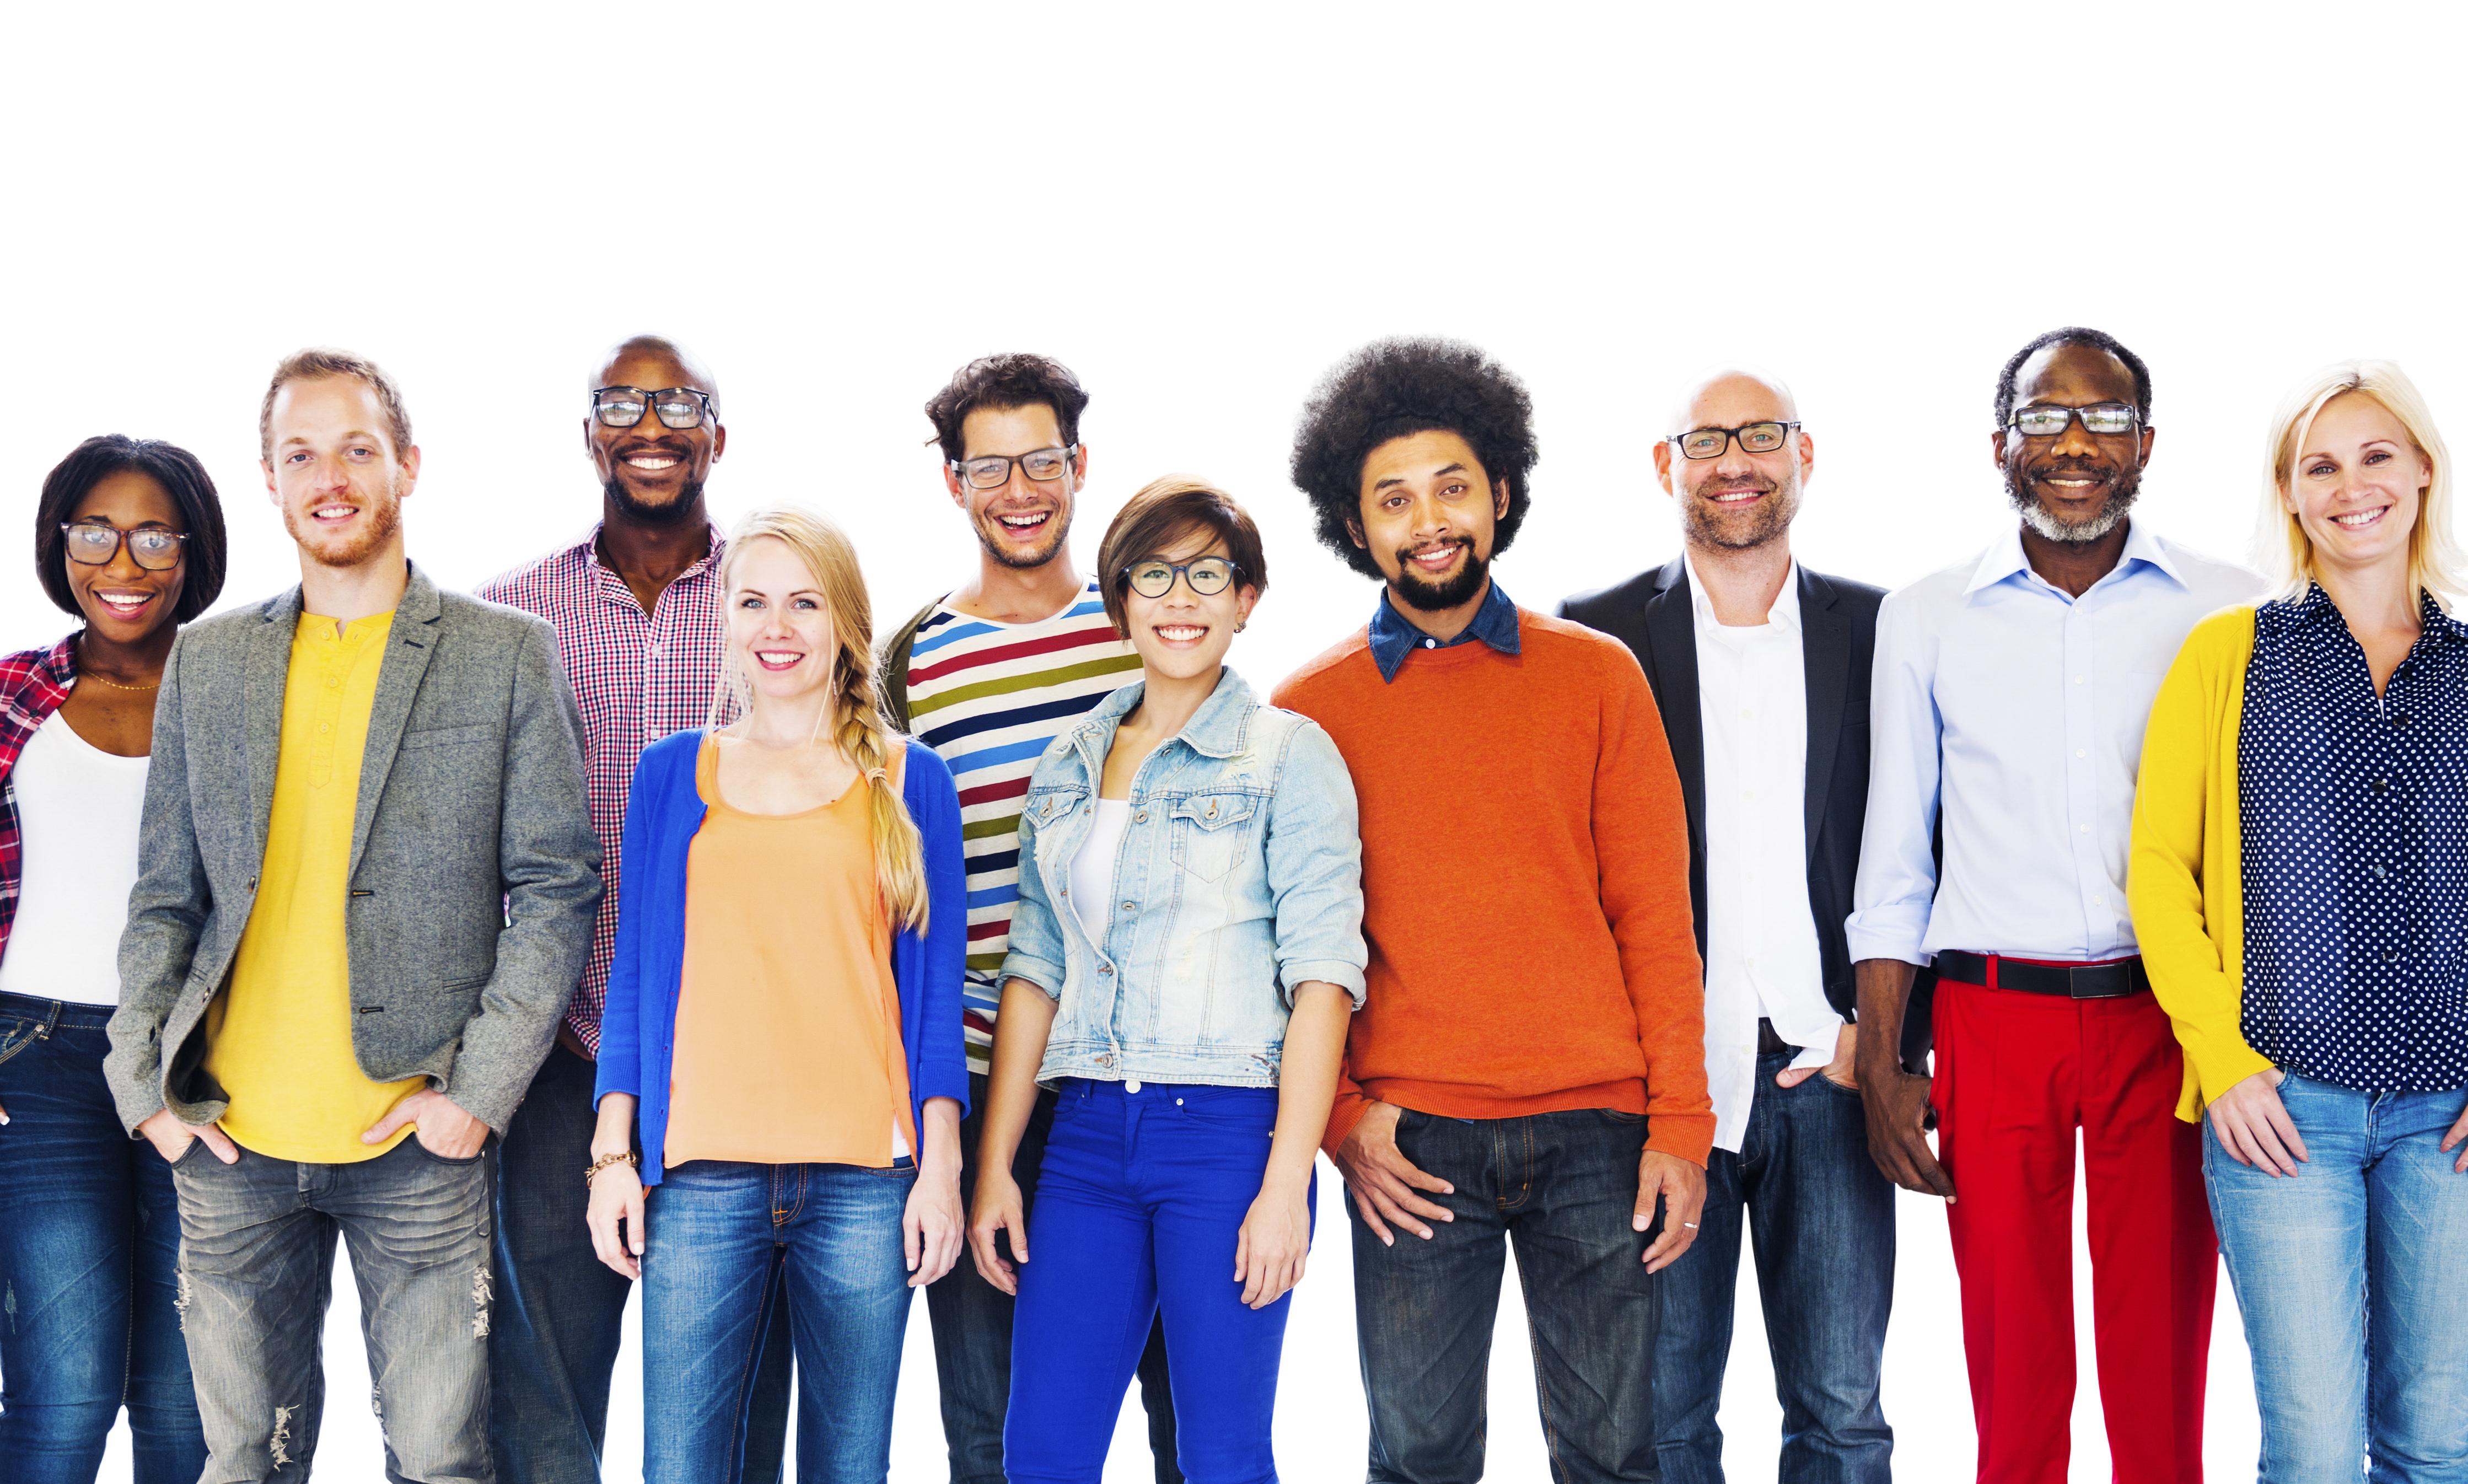 different ethnic group -diversity